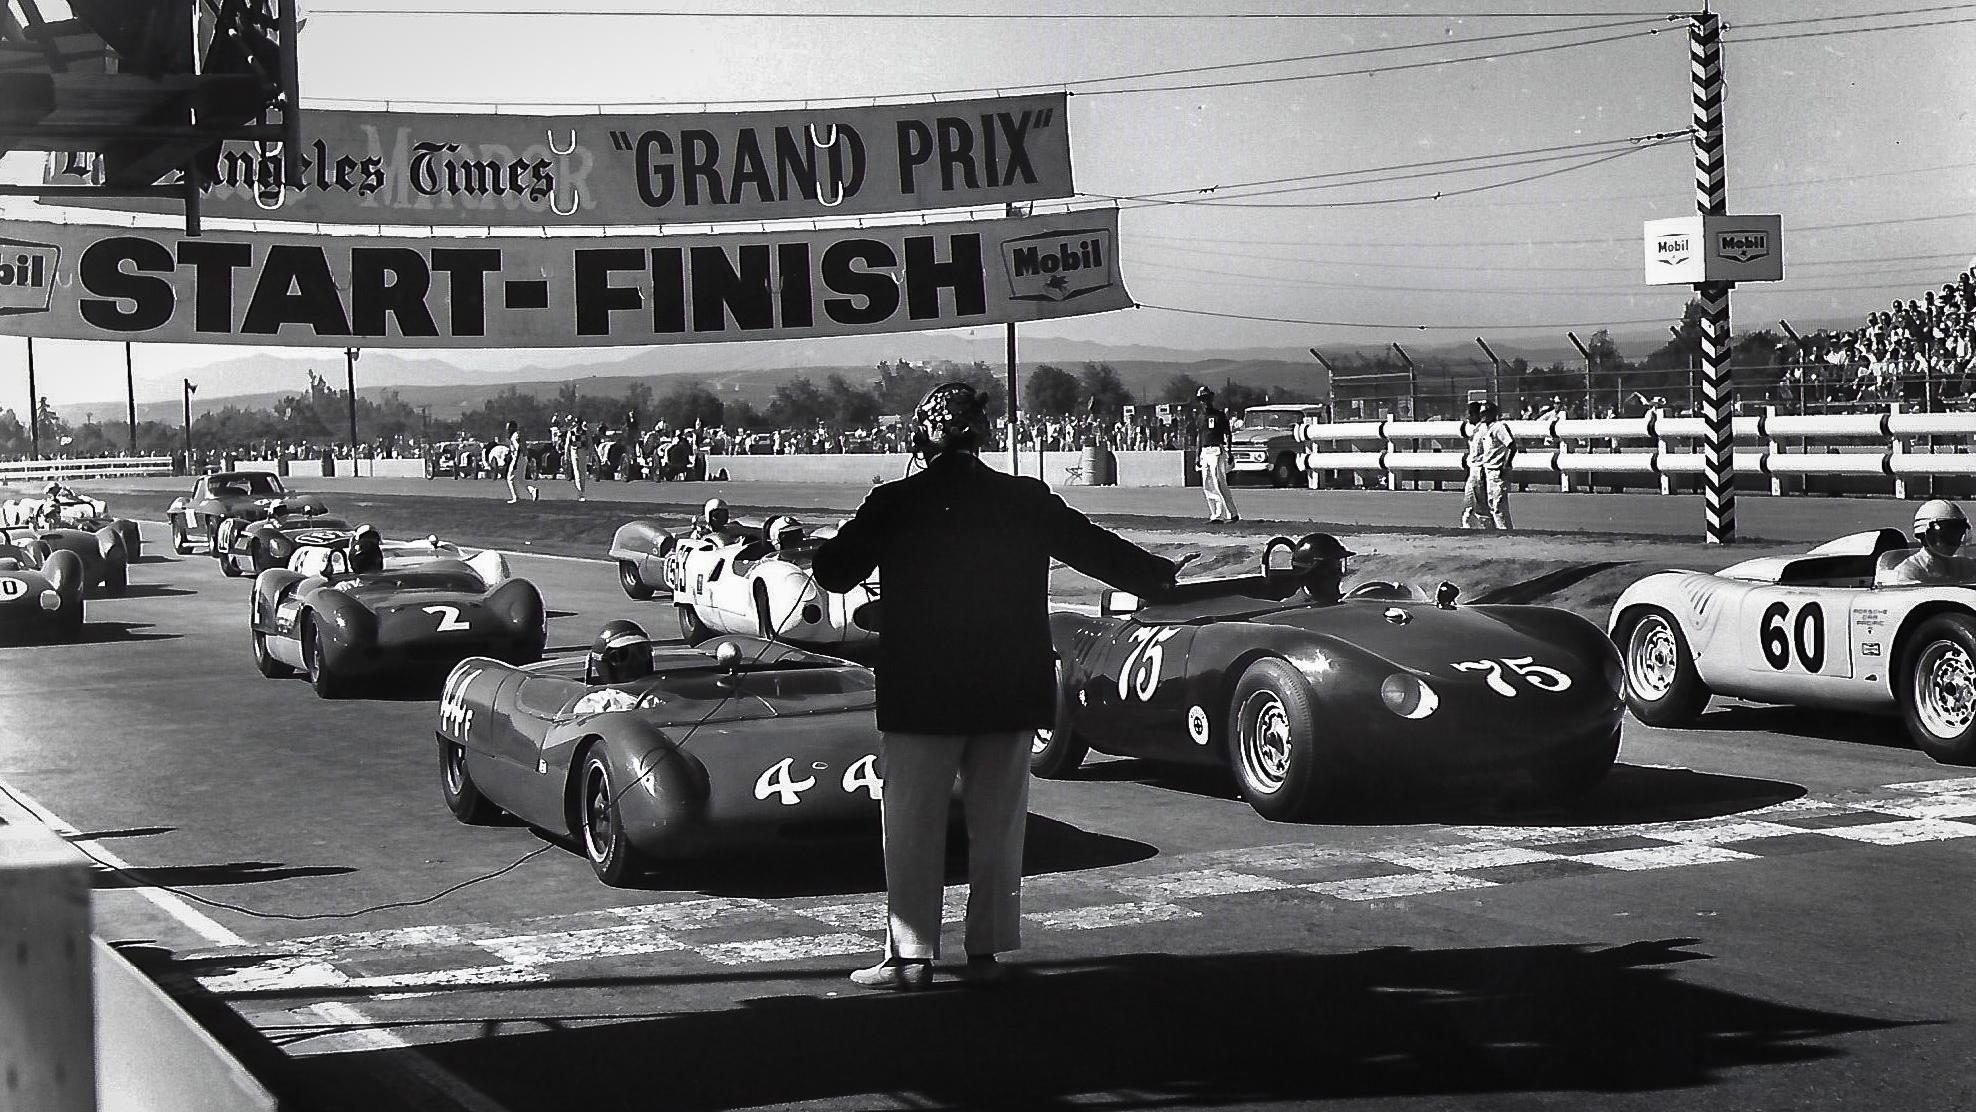 1963 LA Times Grand Prix Riverside California Starting Grid